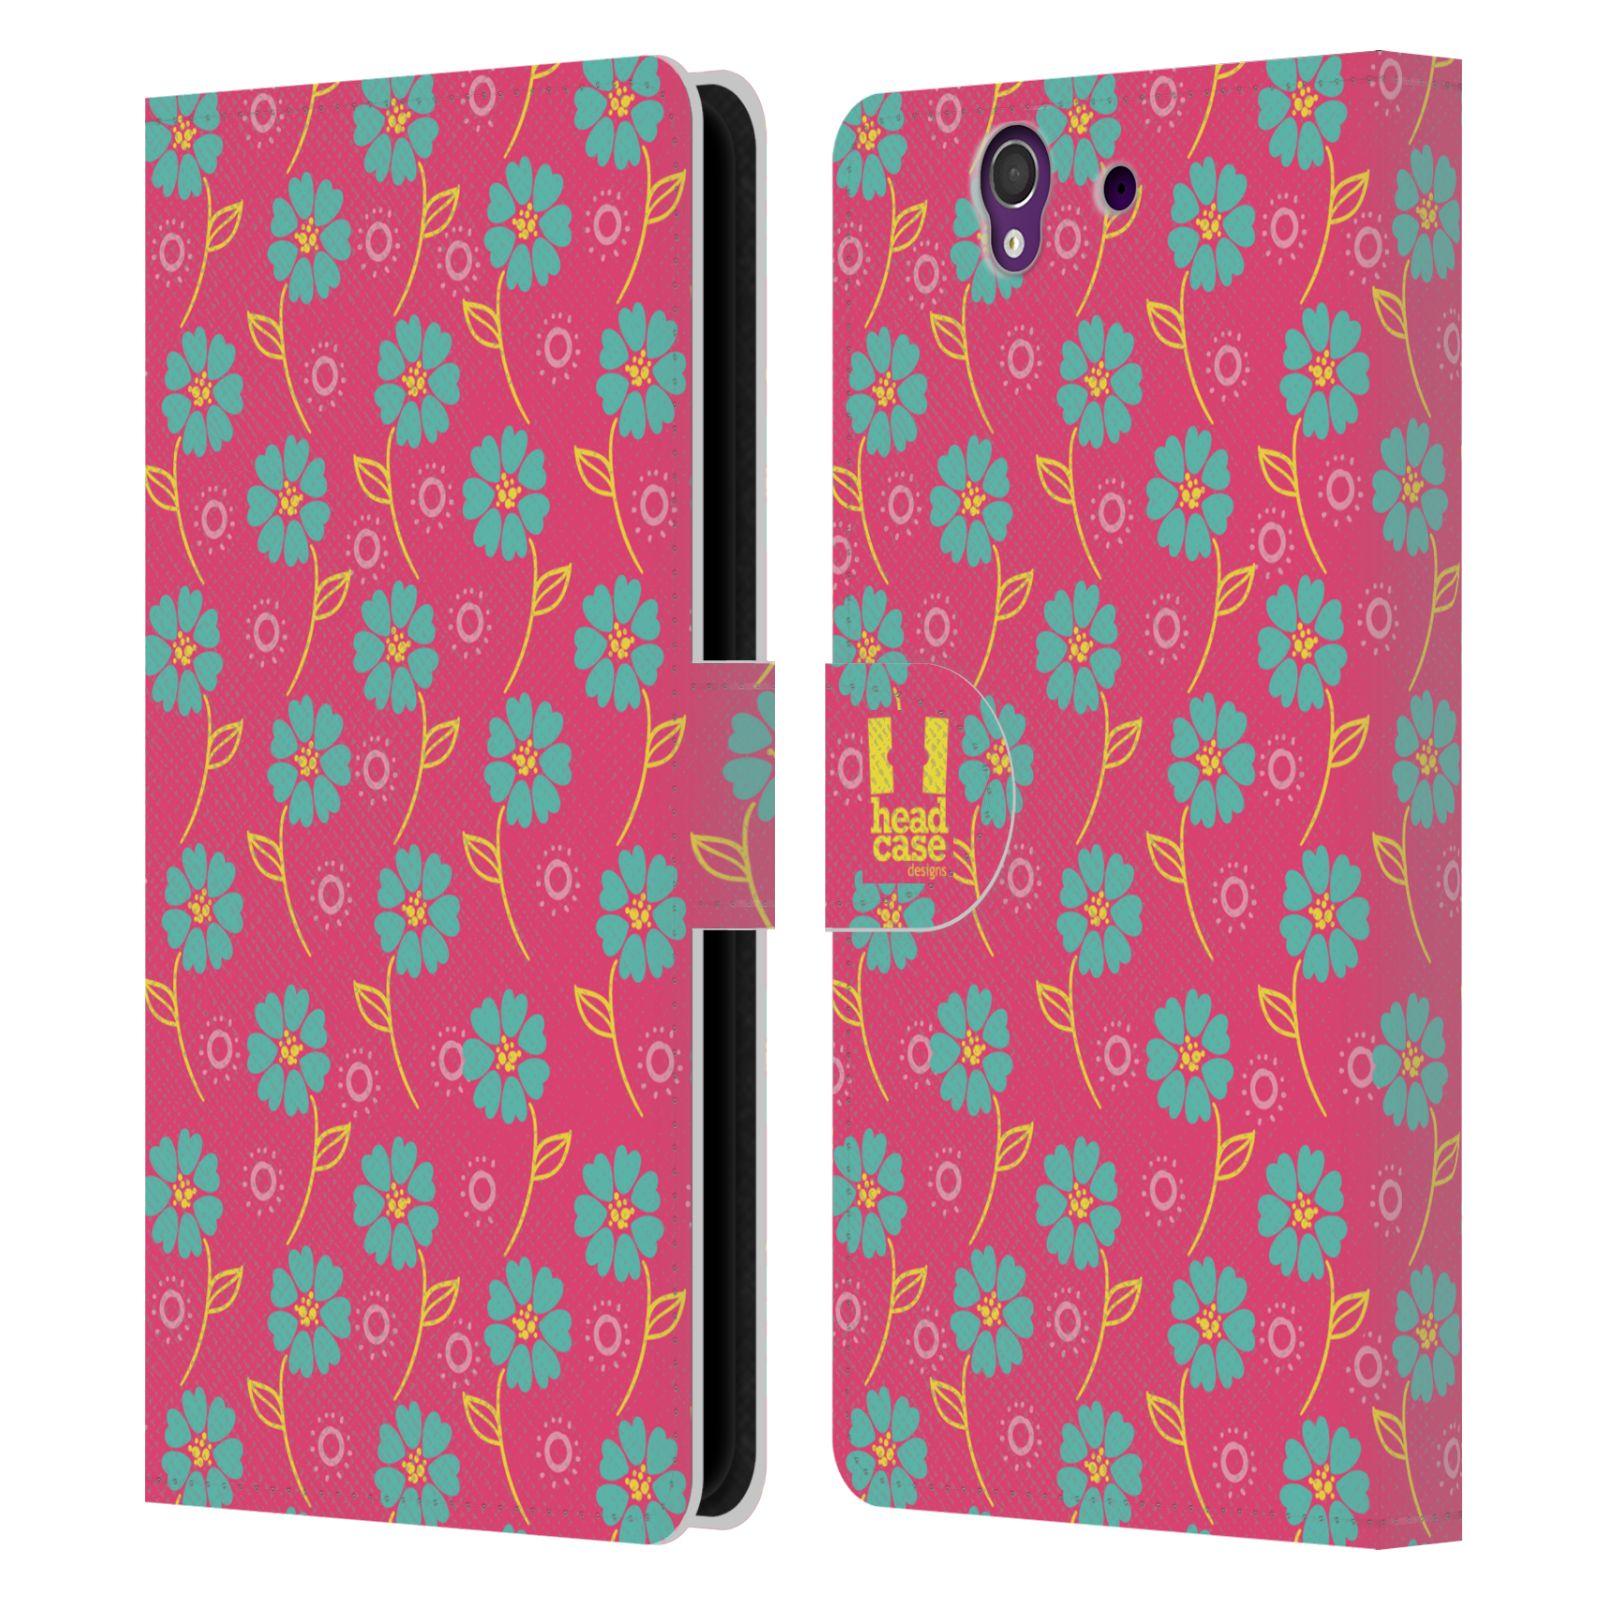 HEAD CASE Flipové pouzdro pro mobil SONY XPERIA Z (C6603) Slovanský vzor růžová a modrá květiny